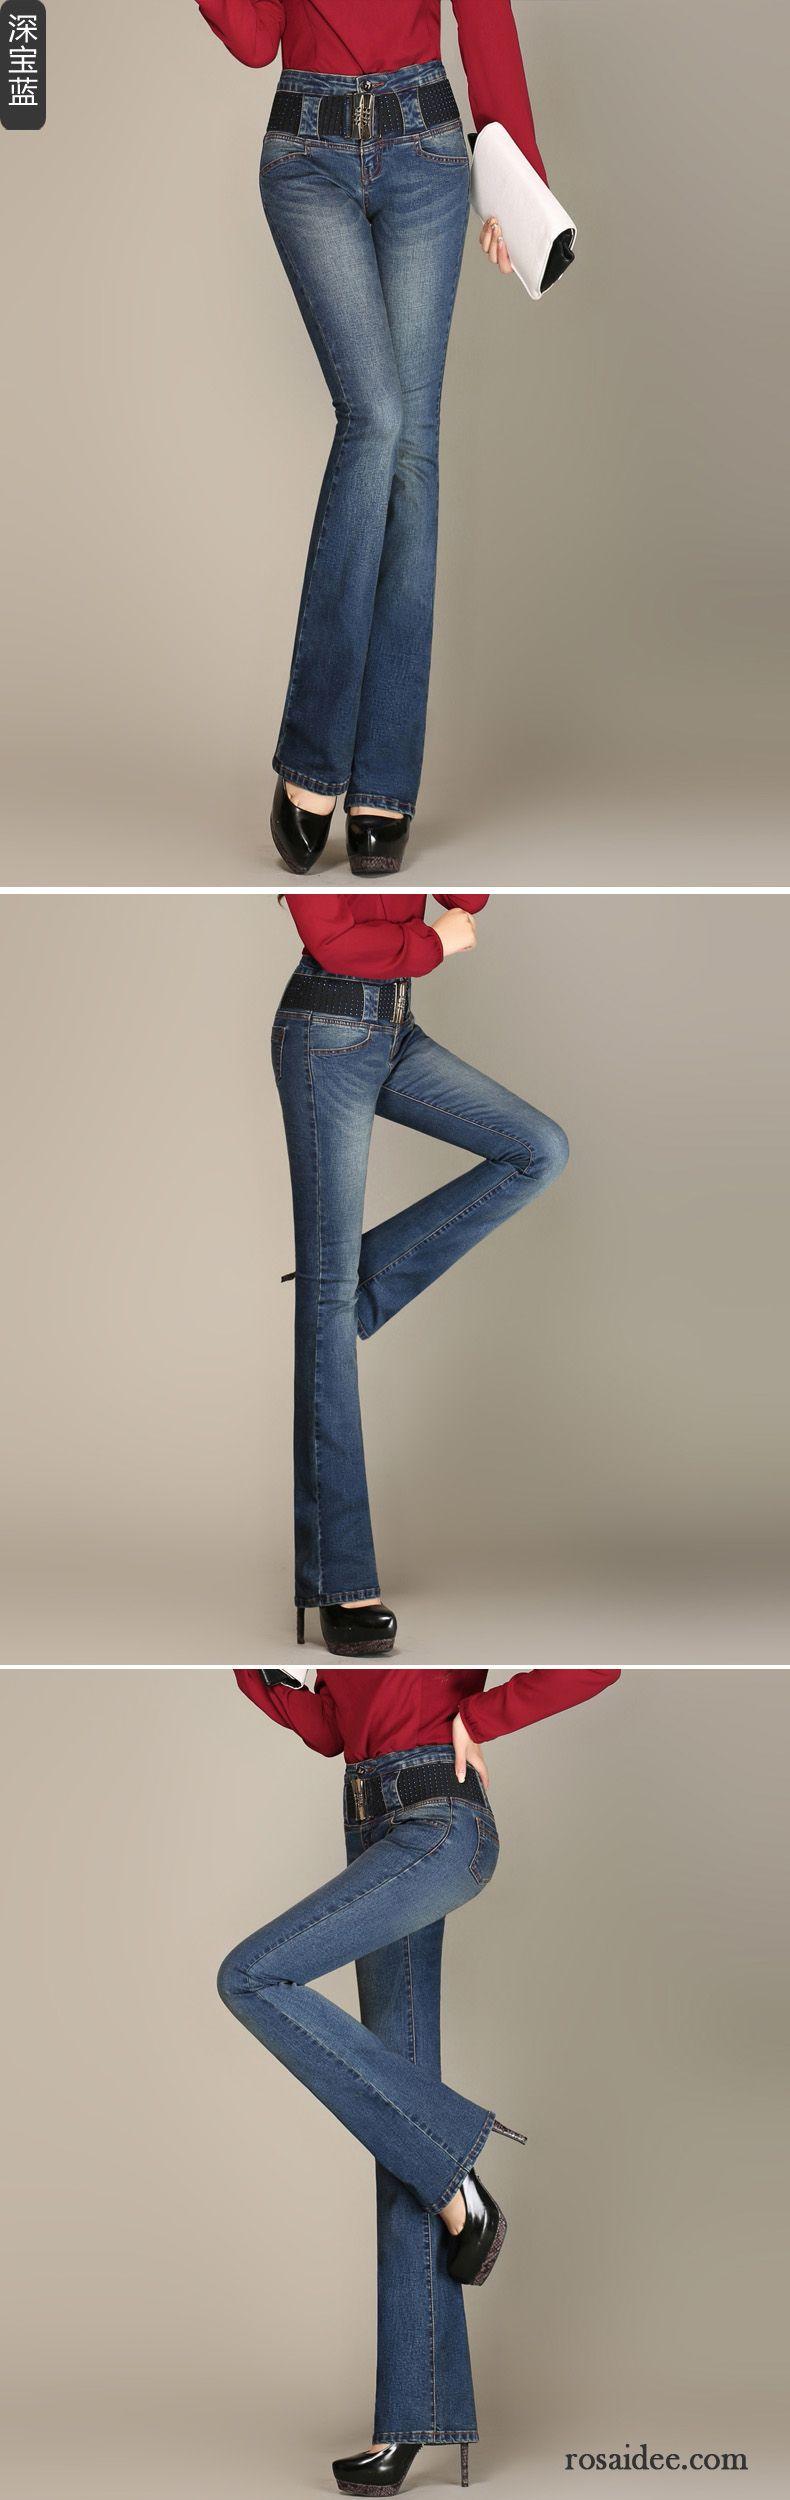 kn chel jeans damen leicht neu hohe taille hose elastisch. Black Bedroom Furniture Sets. Home Design Ideas